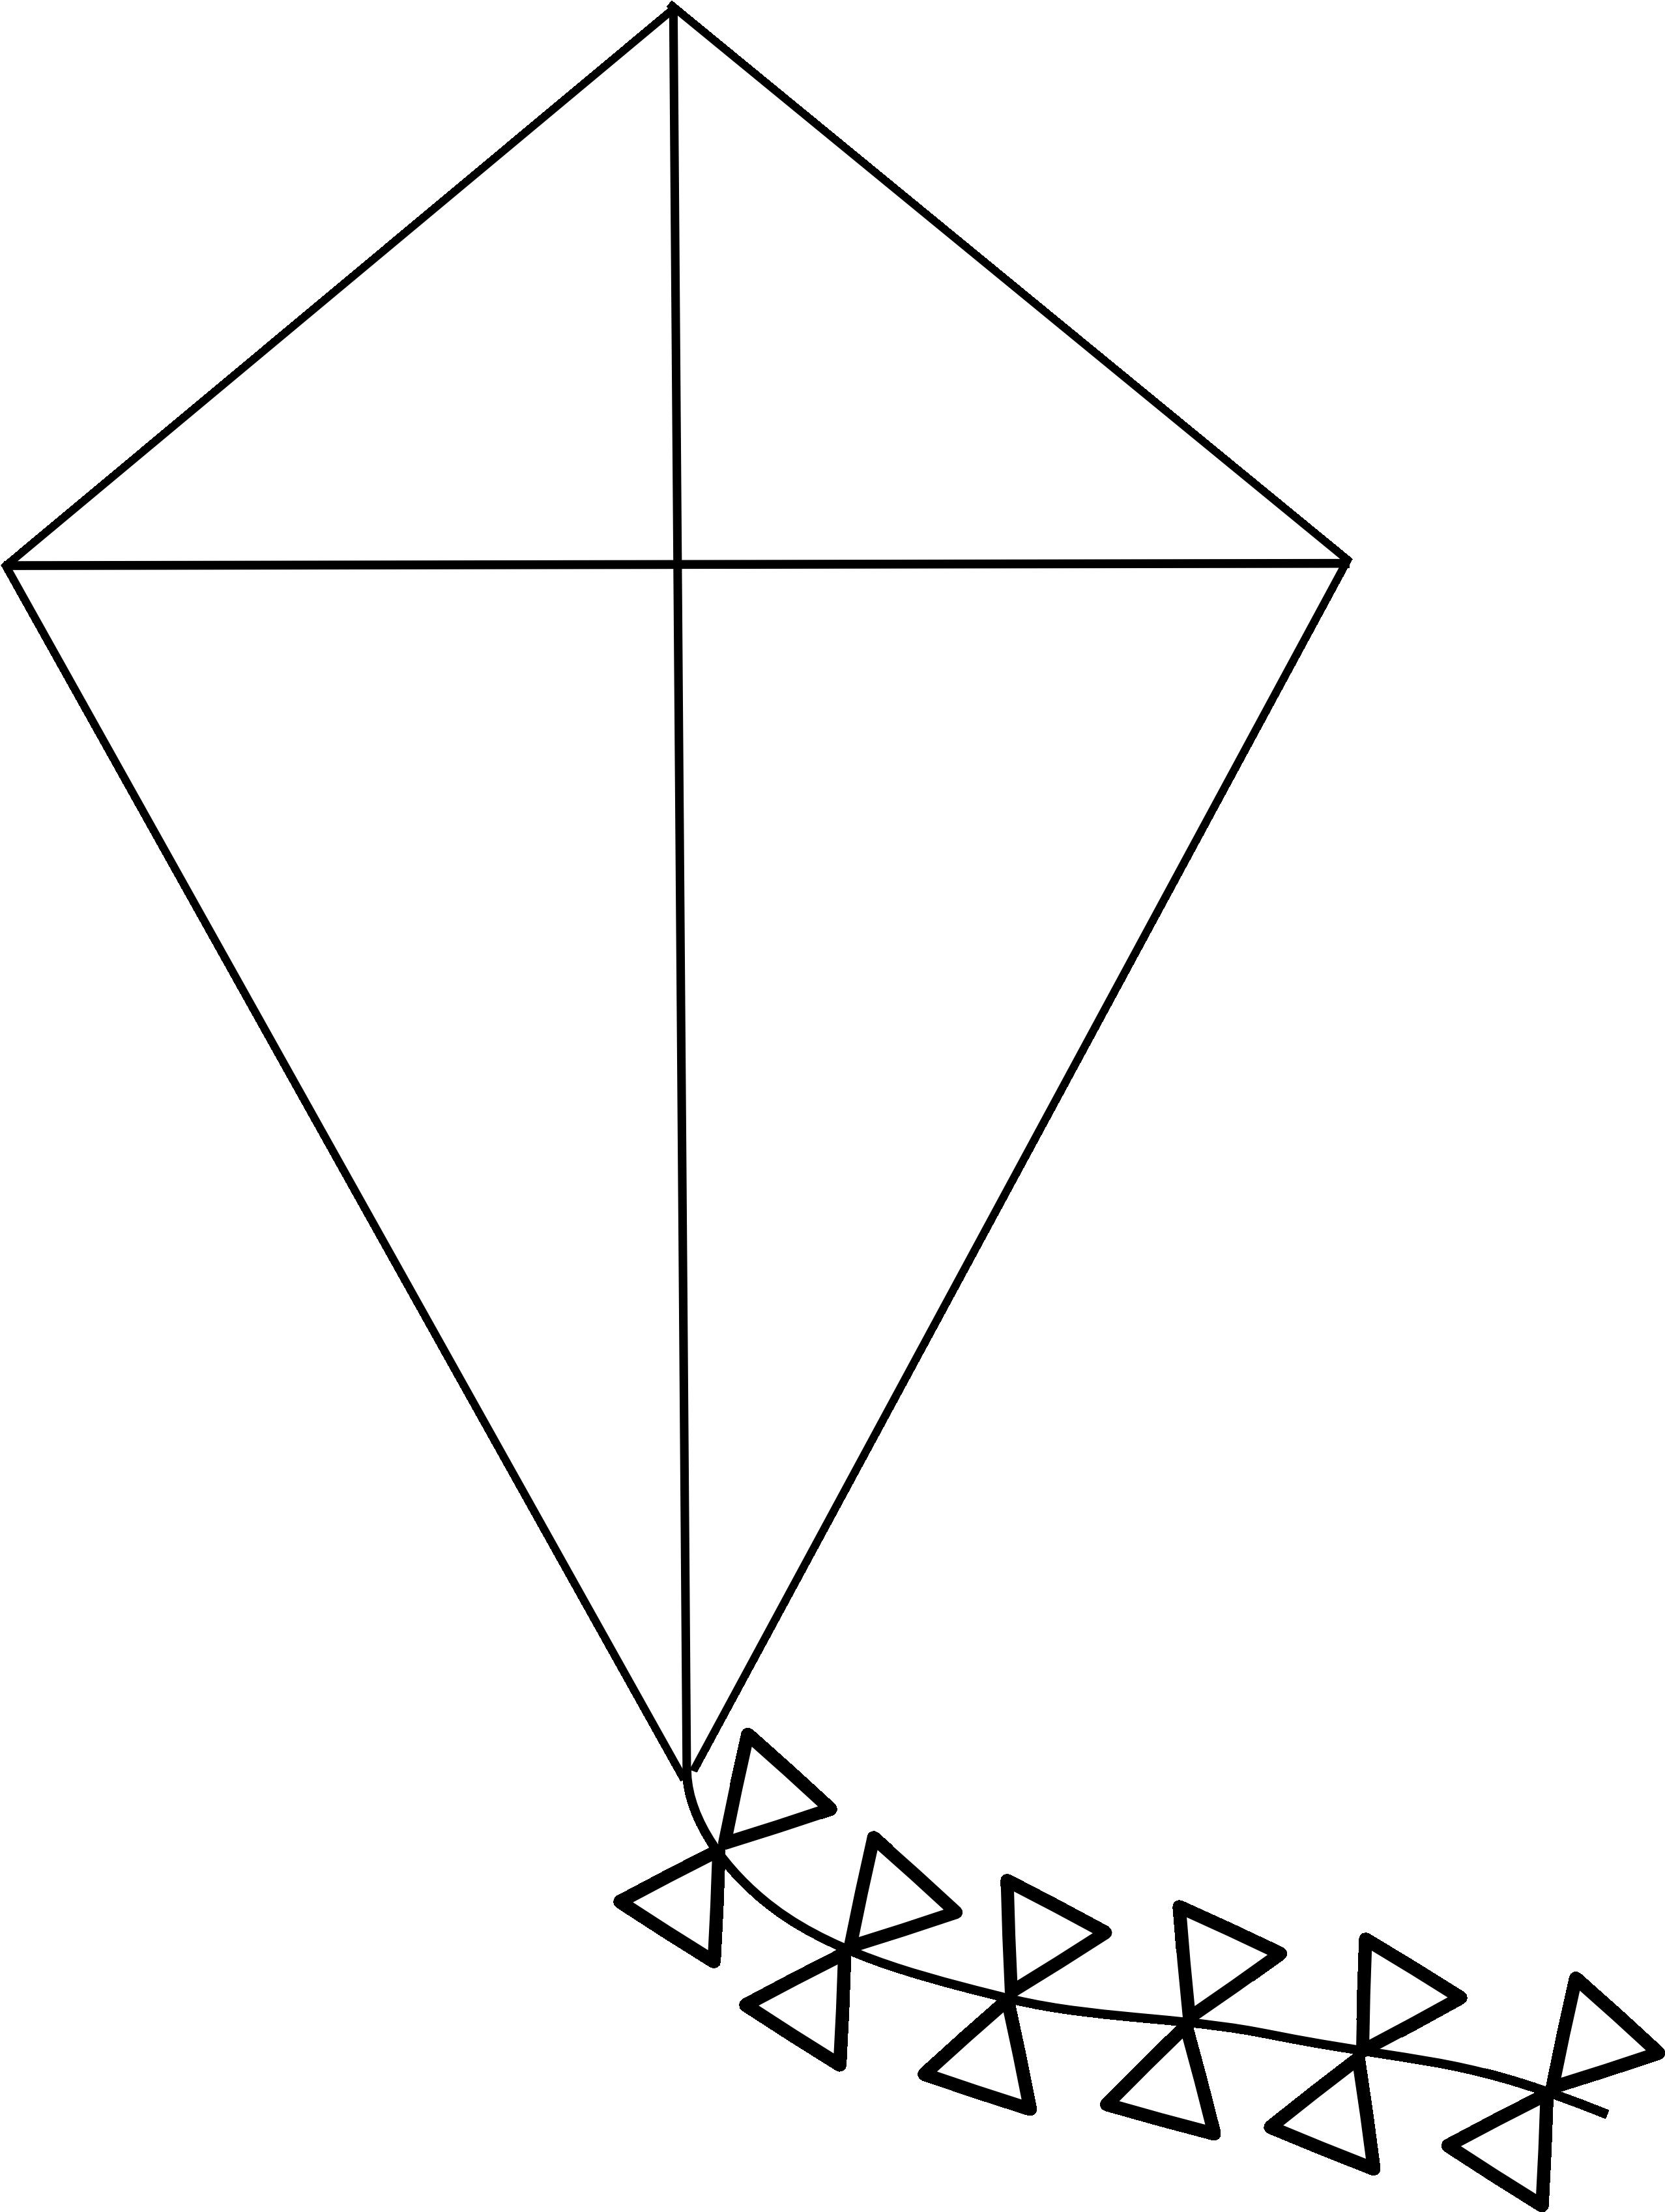 Line Drawing Kite : Kite clipart black and white panda free